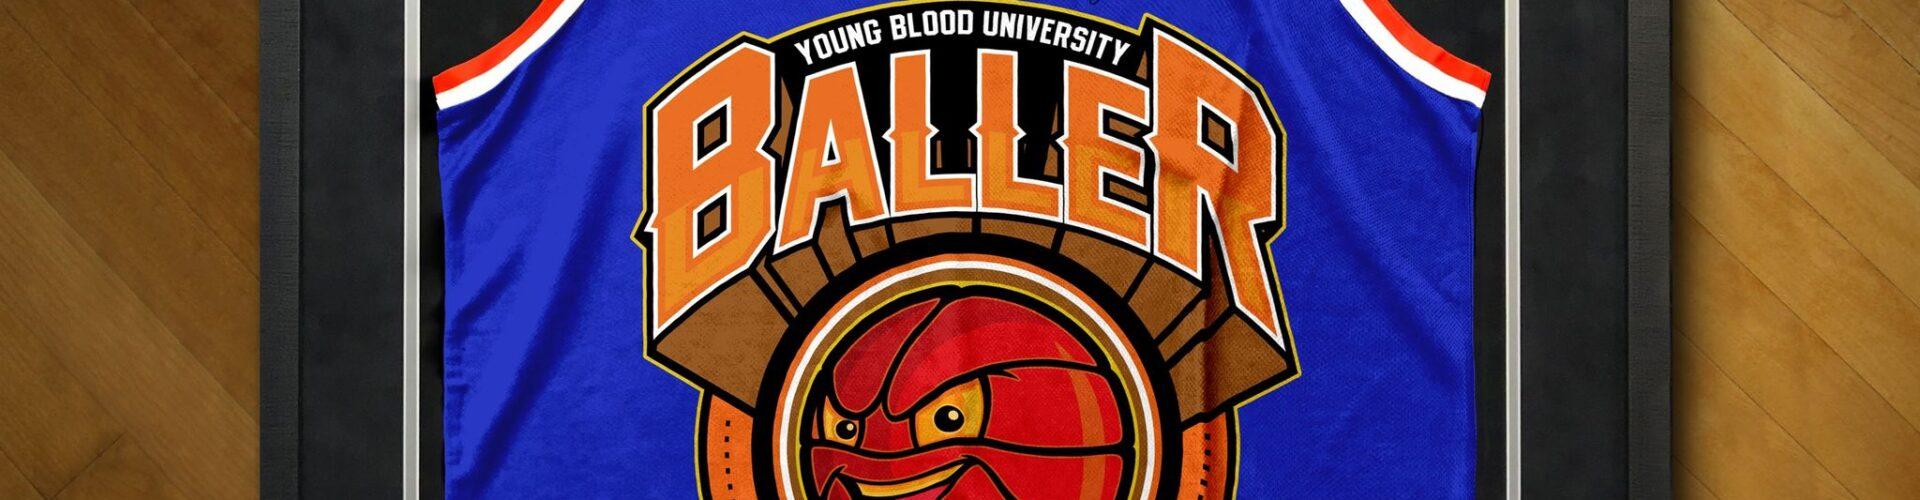 El trapero argentino Lucho SSJ  lanza su nuevo disco titulado Baller